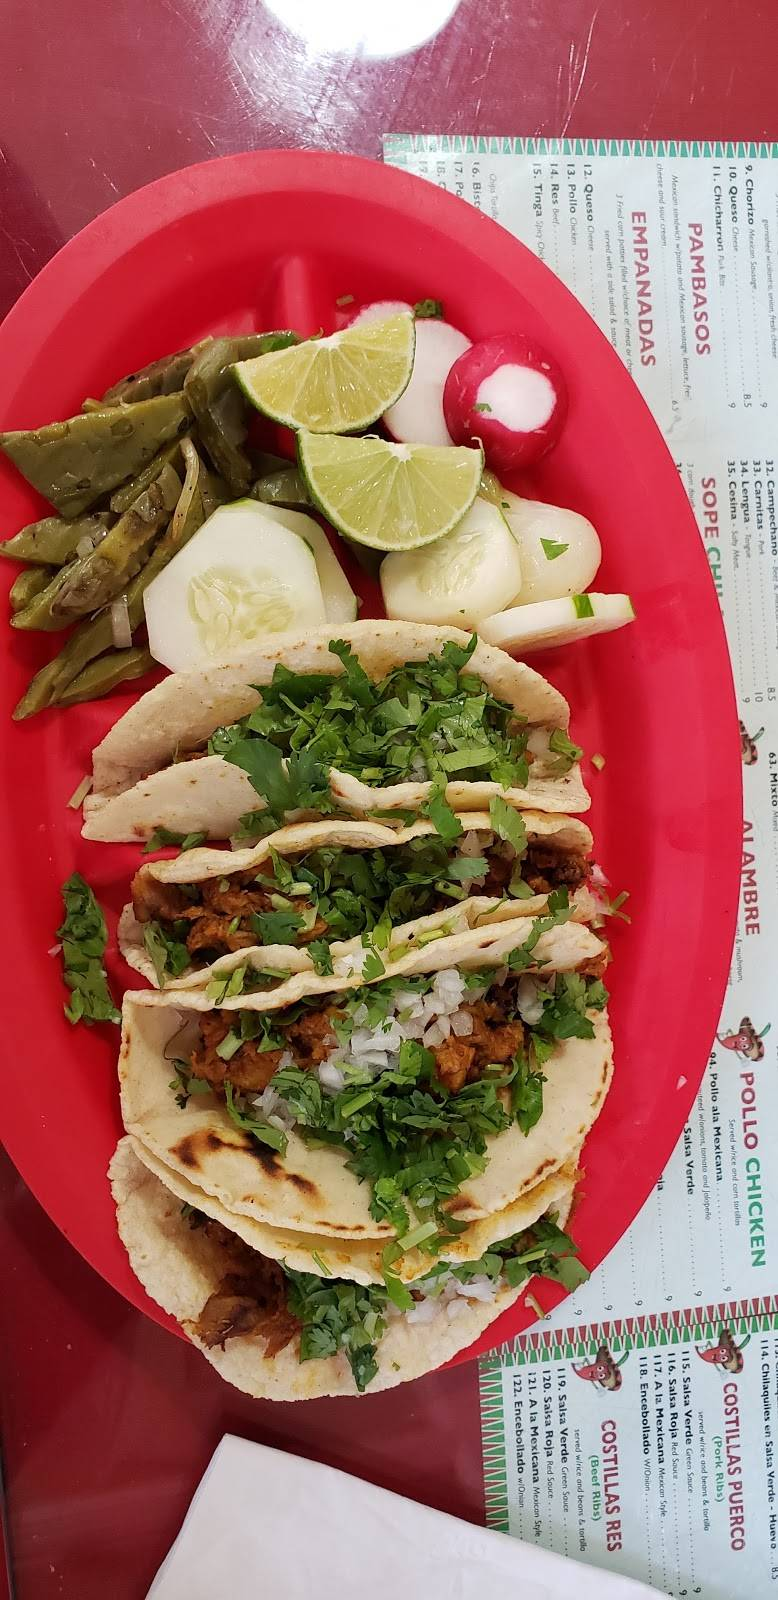 Vista Hermosa | restaurant | 35 Ridgefield Ave, Ridgefield Park, NJ 07660, USA | 2013739463 OR +1 201-373-9463